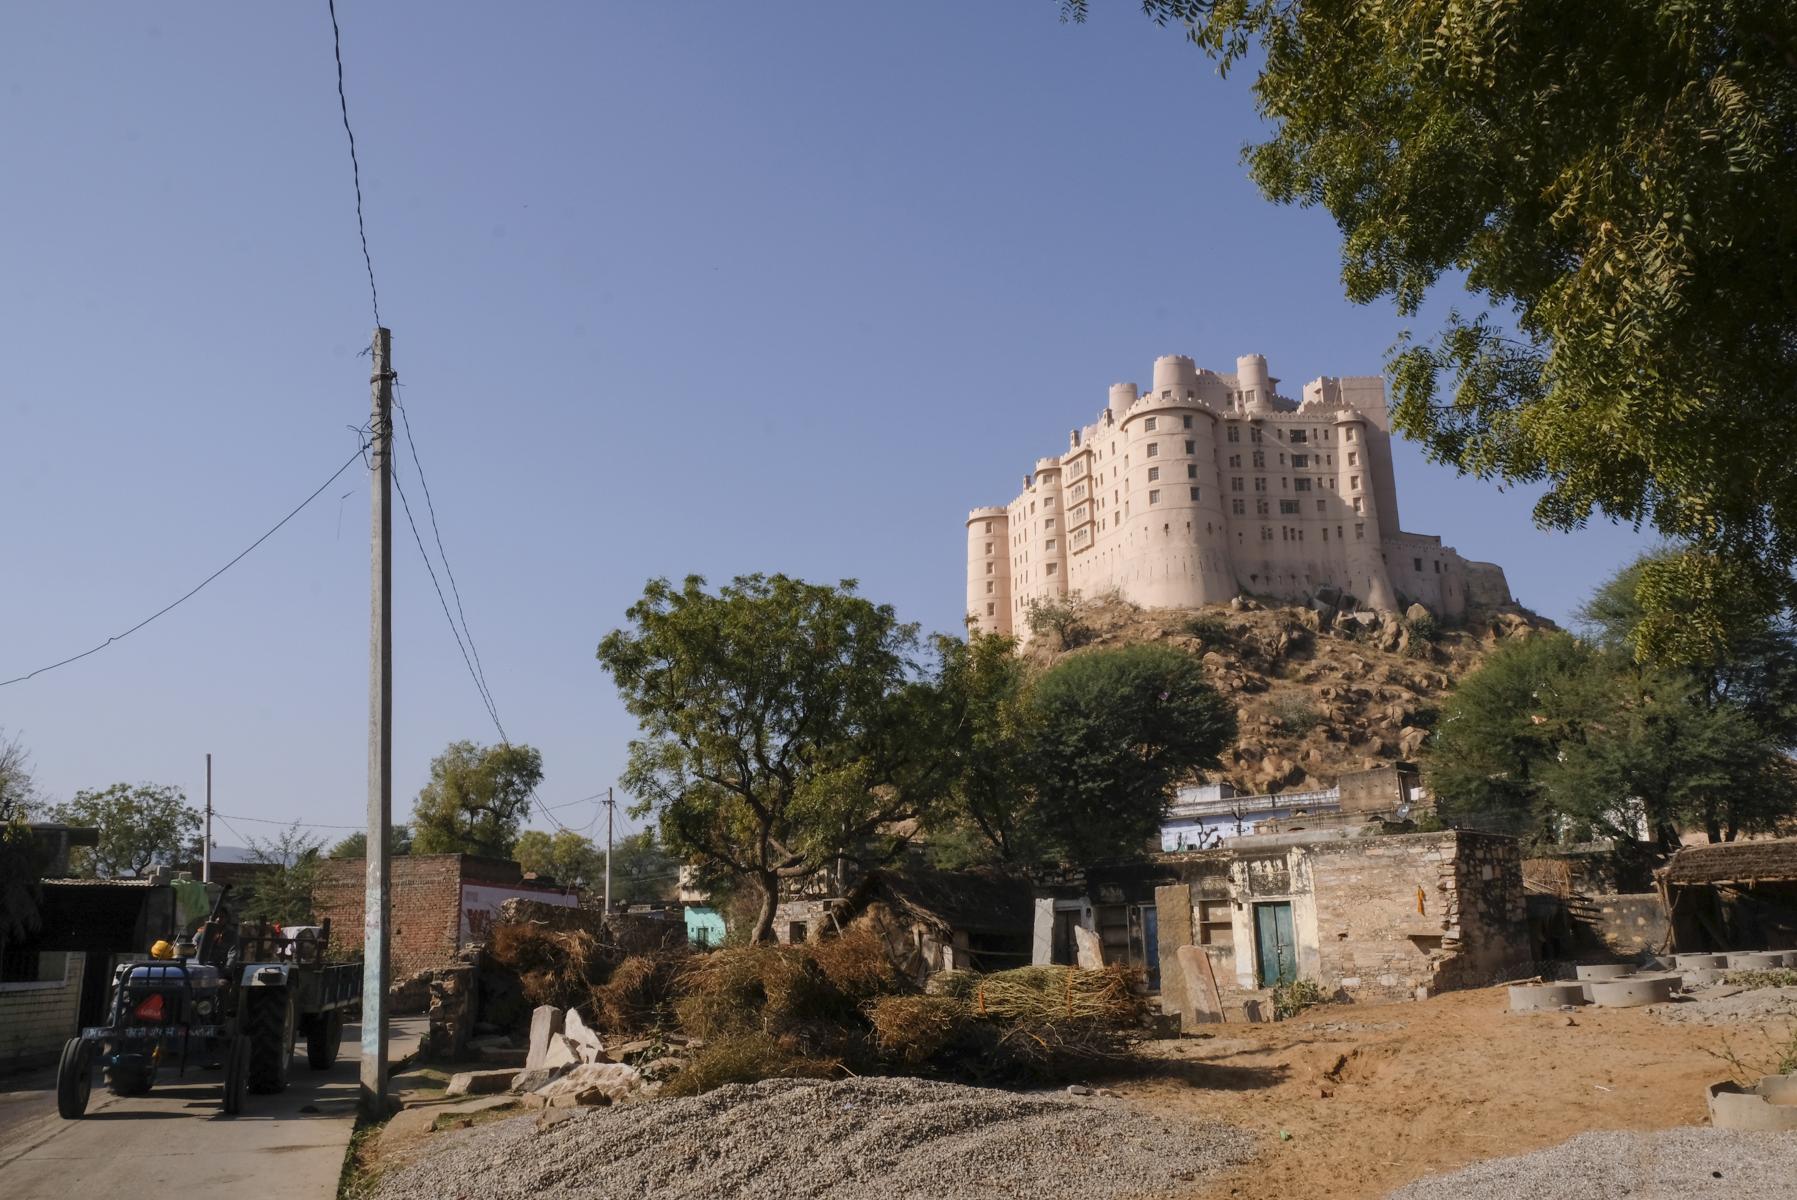 Alila Fort Bishangarh-0669.jpg